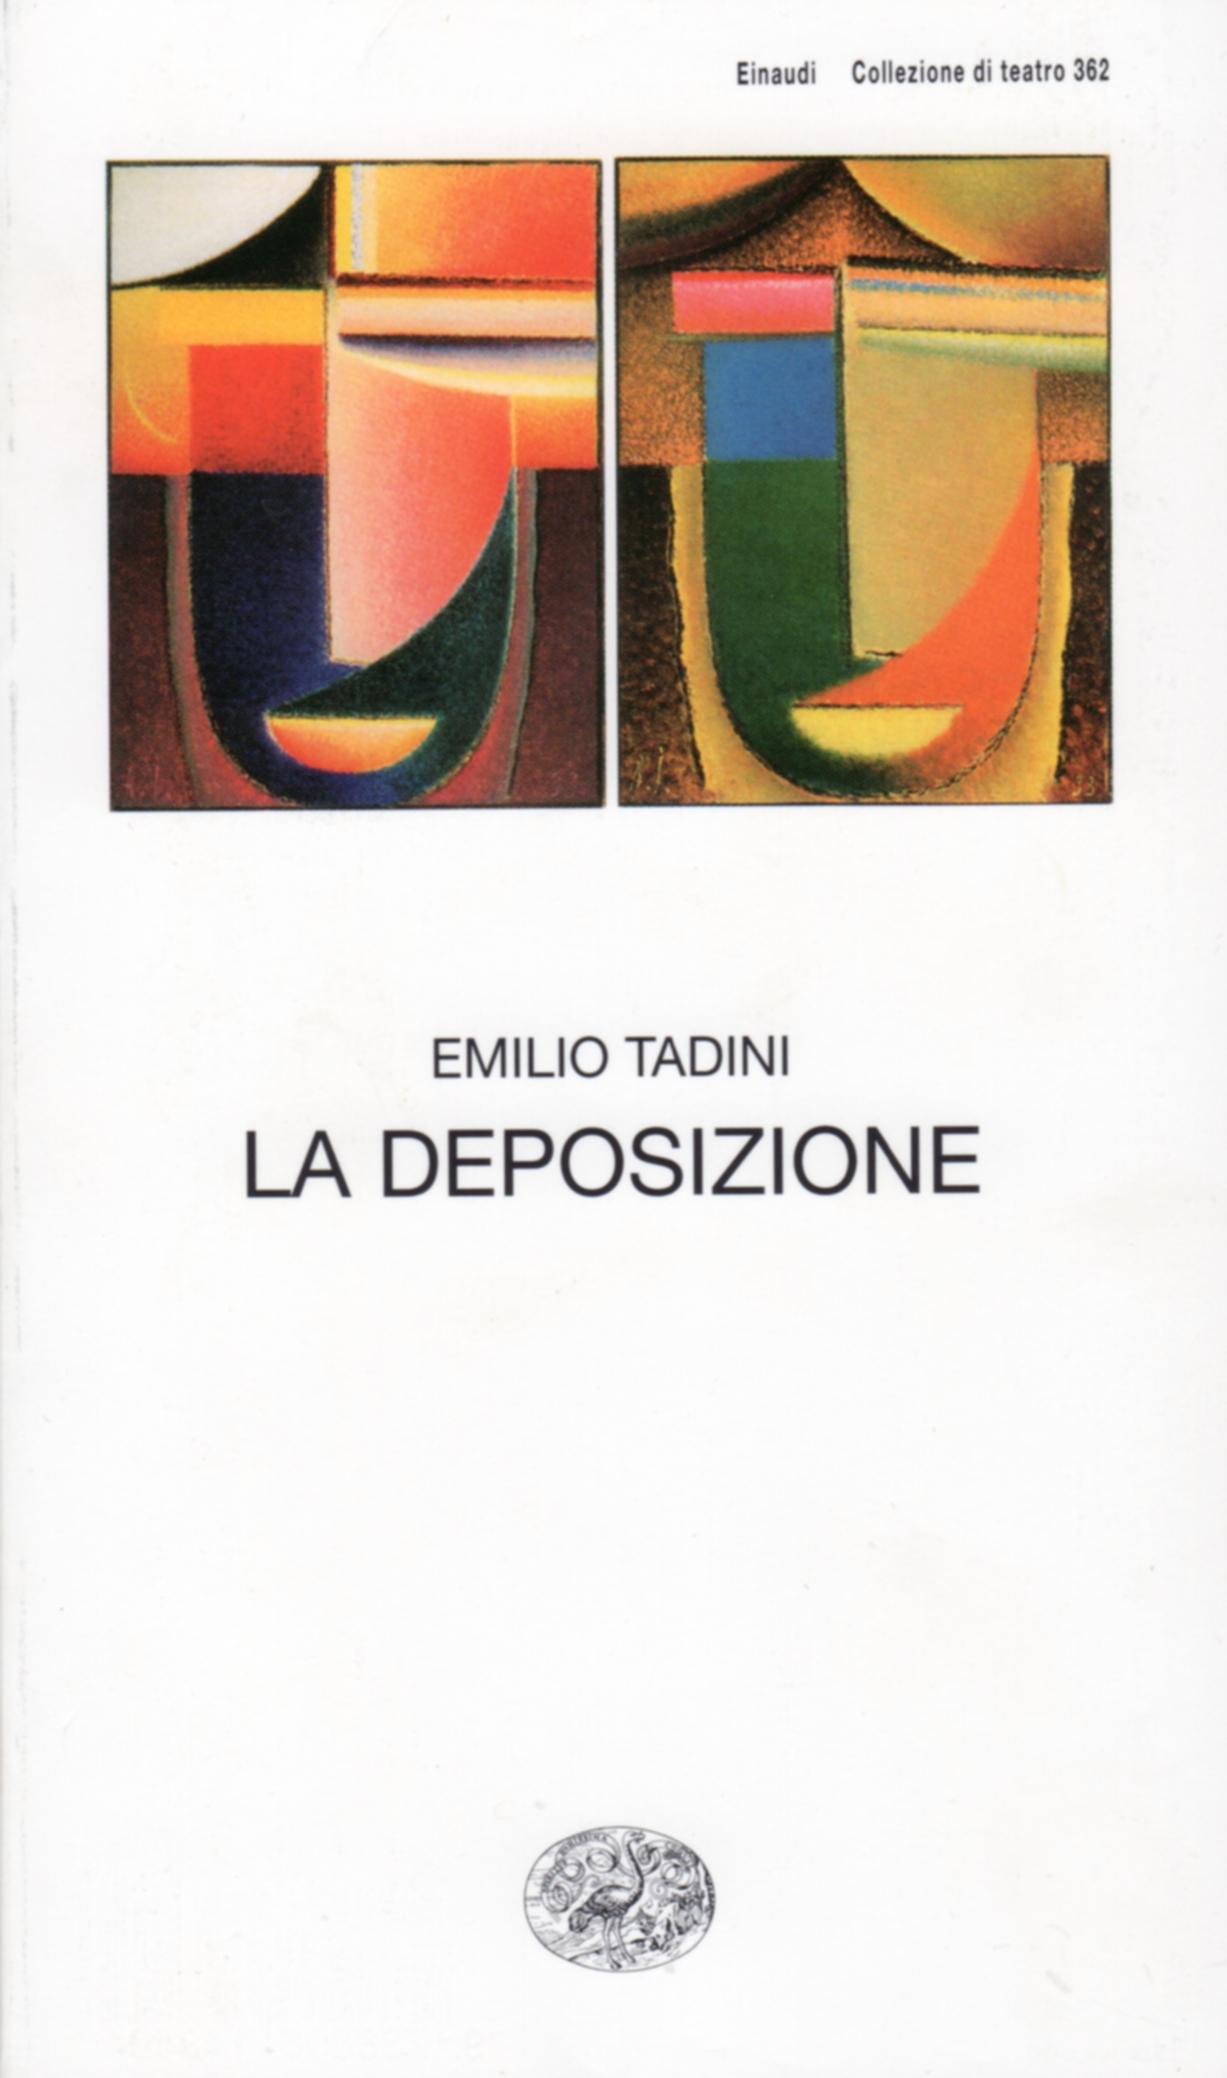 Andrée Ruth Shammah regista de La deposizione di Emilio Tadini